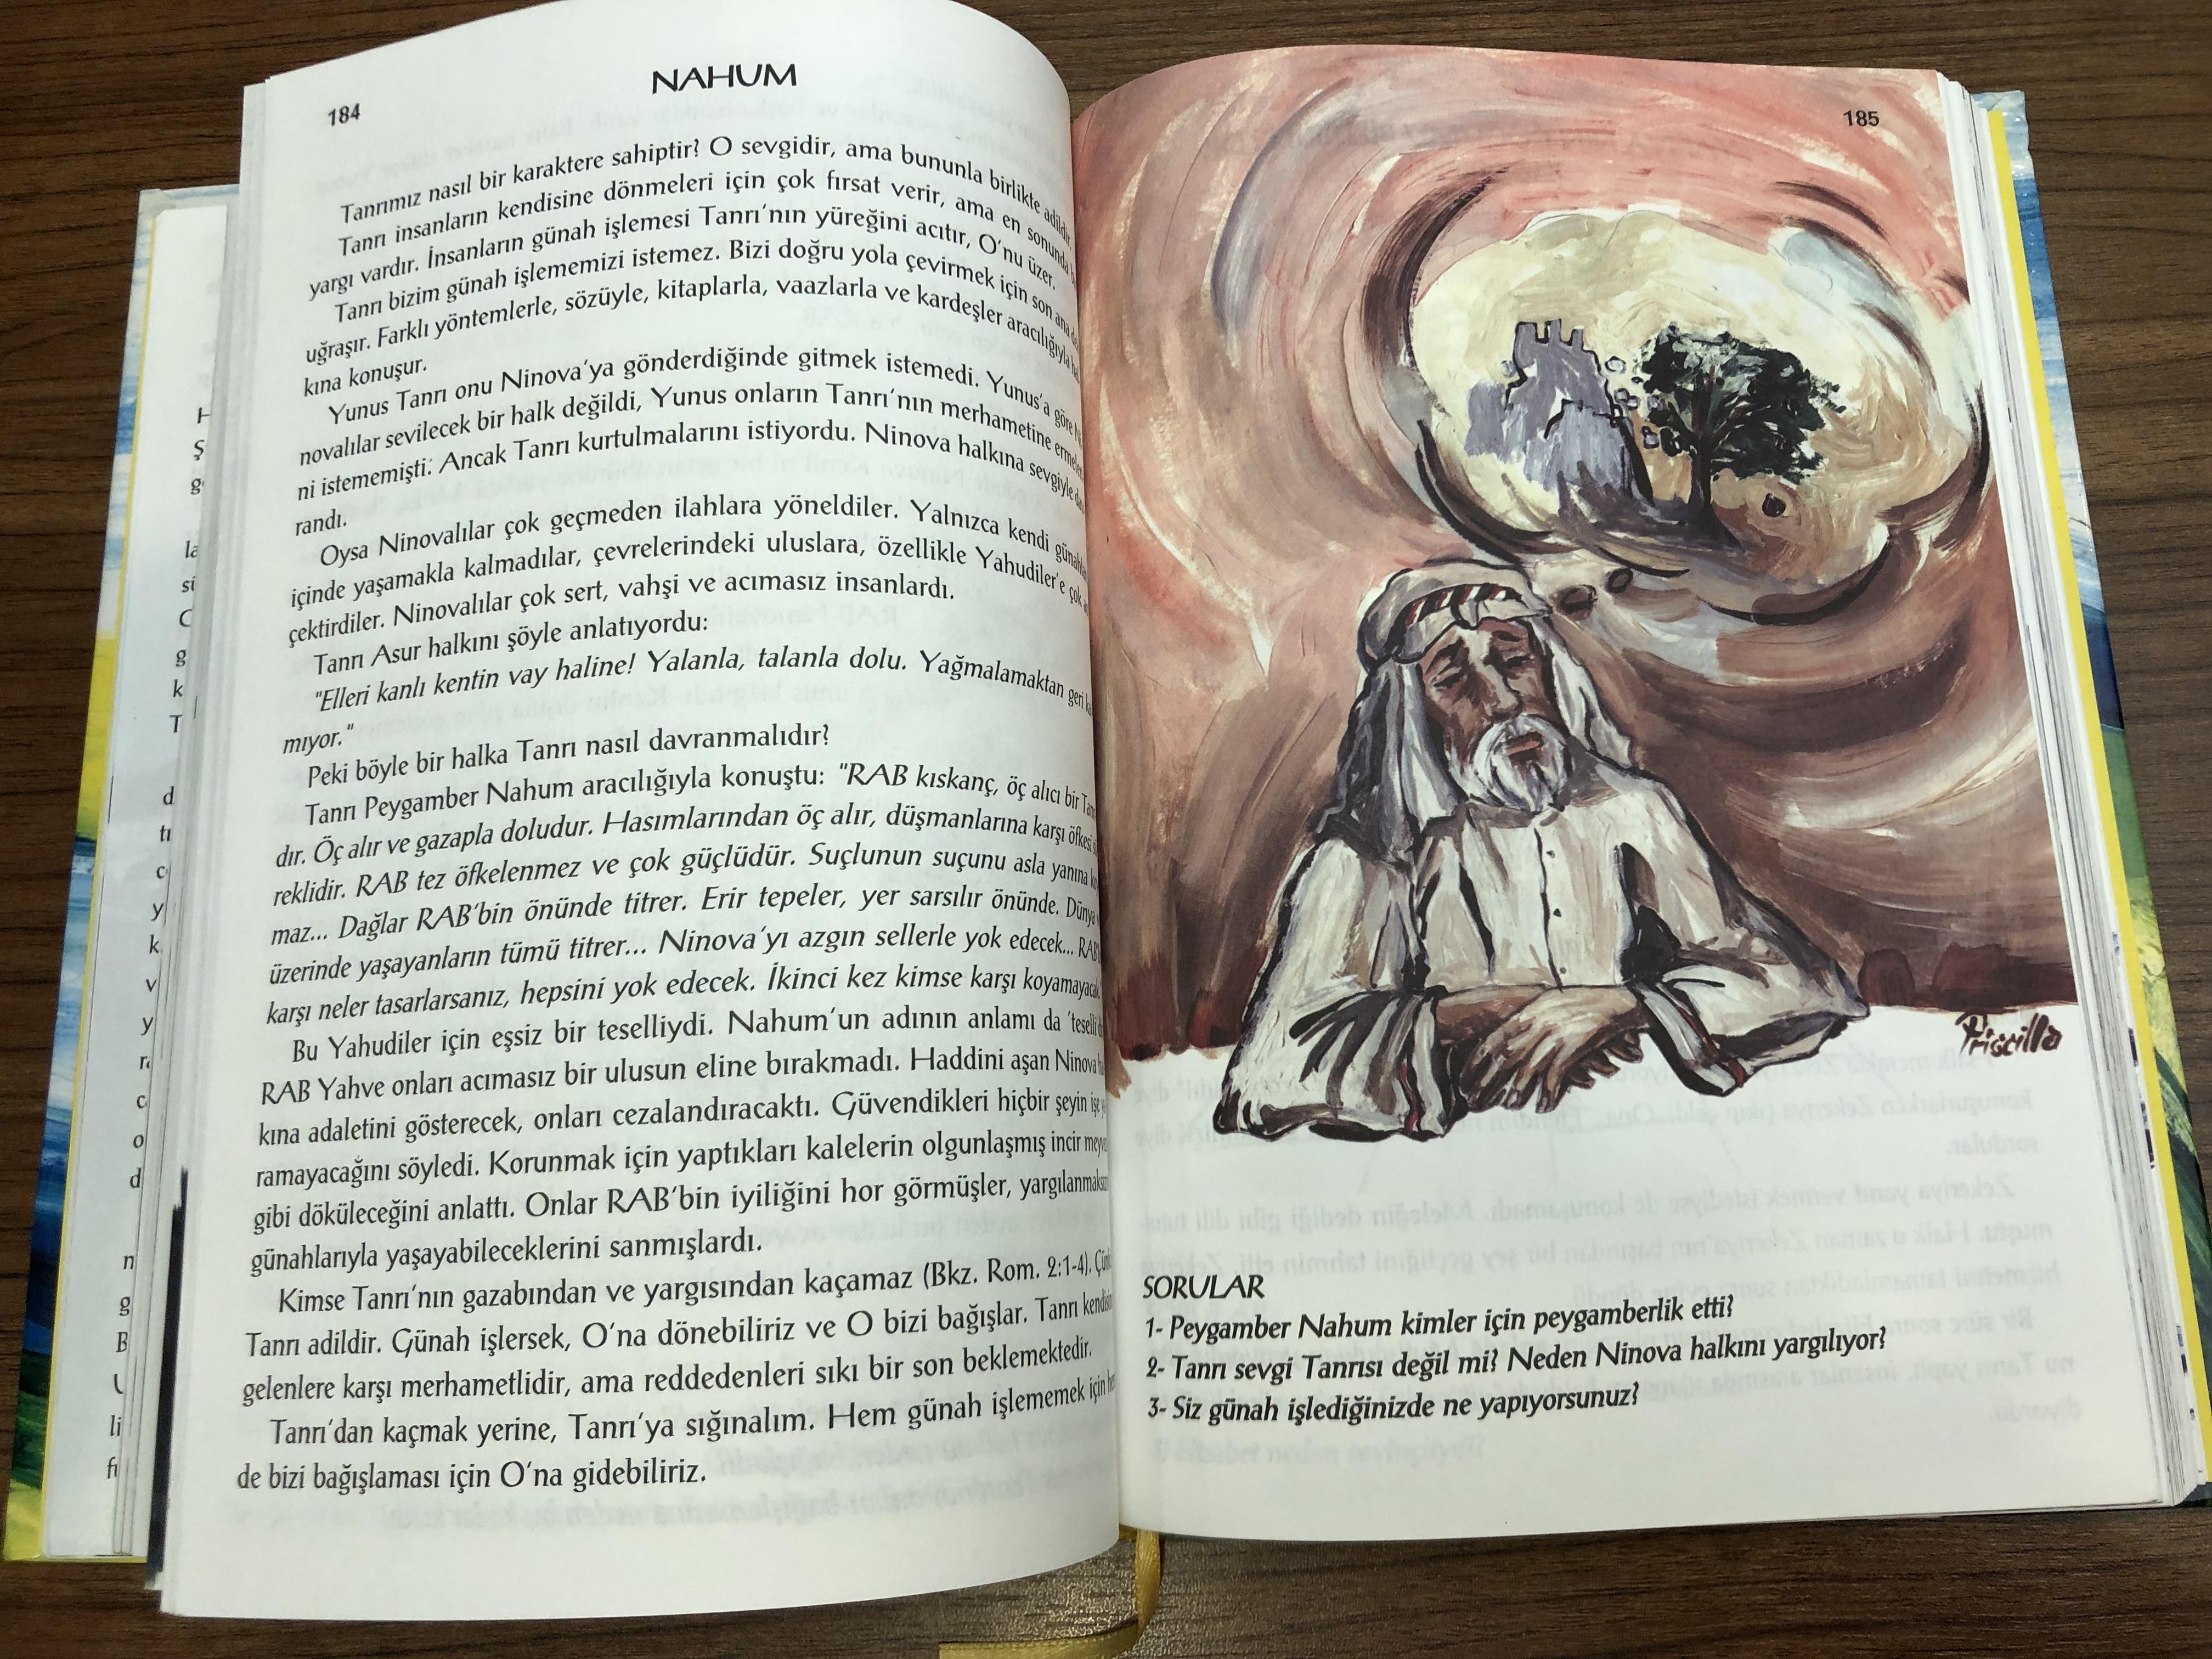 -ocuklar-i-in-kutsal-kitap-tan-yk-ler-yazan-soner-tufan-bible-stories-for-children-in-turkish-7-.jpg